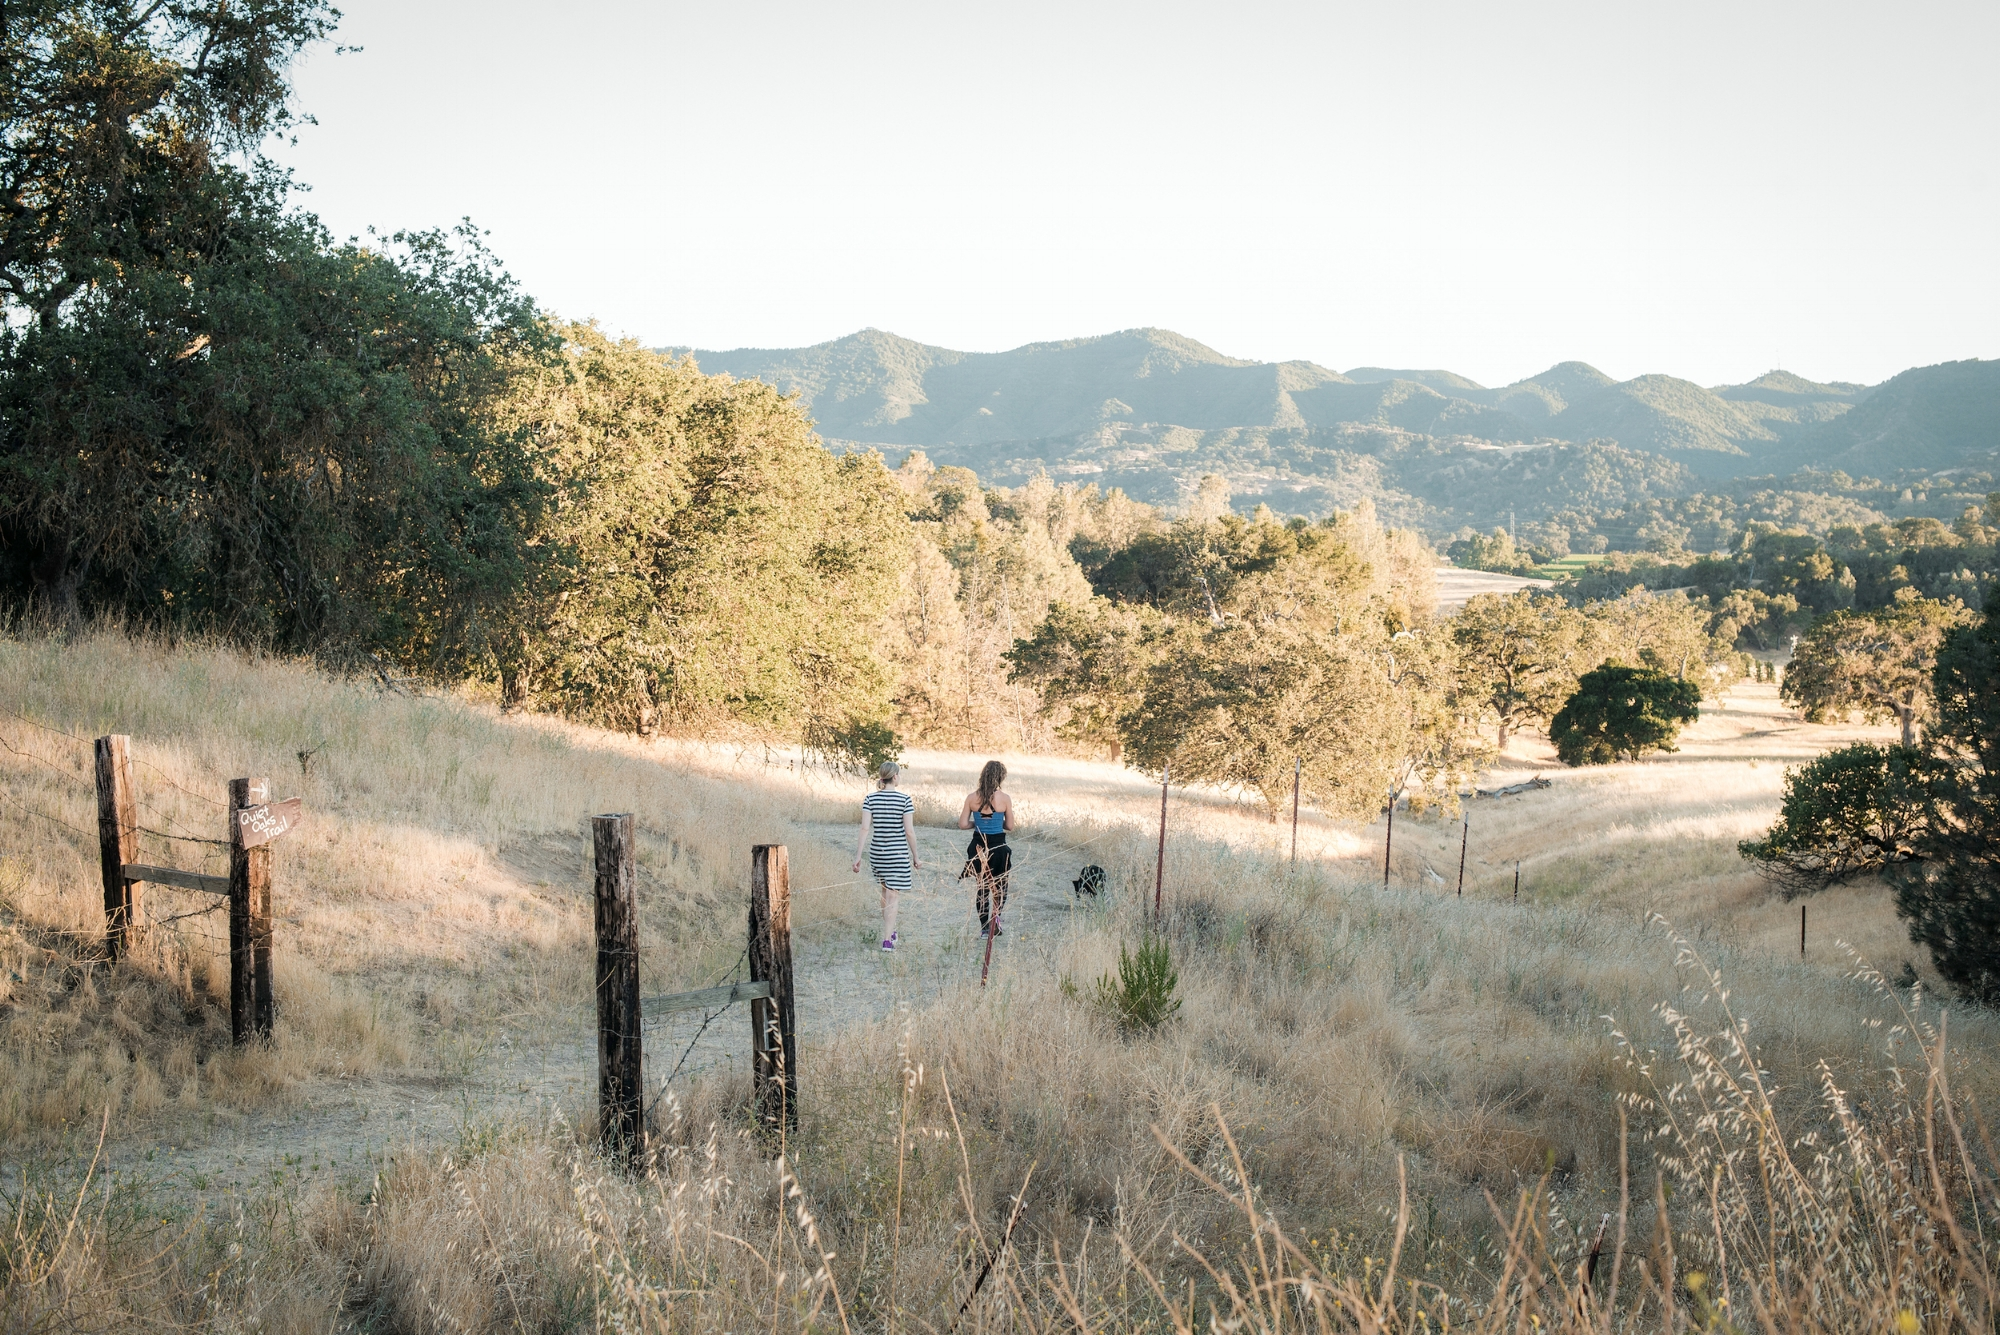 45-acre mountain sanctuary in California's Central Coast